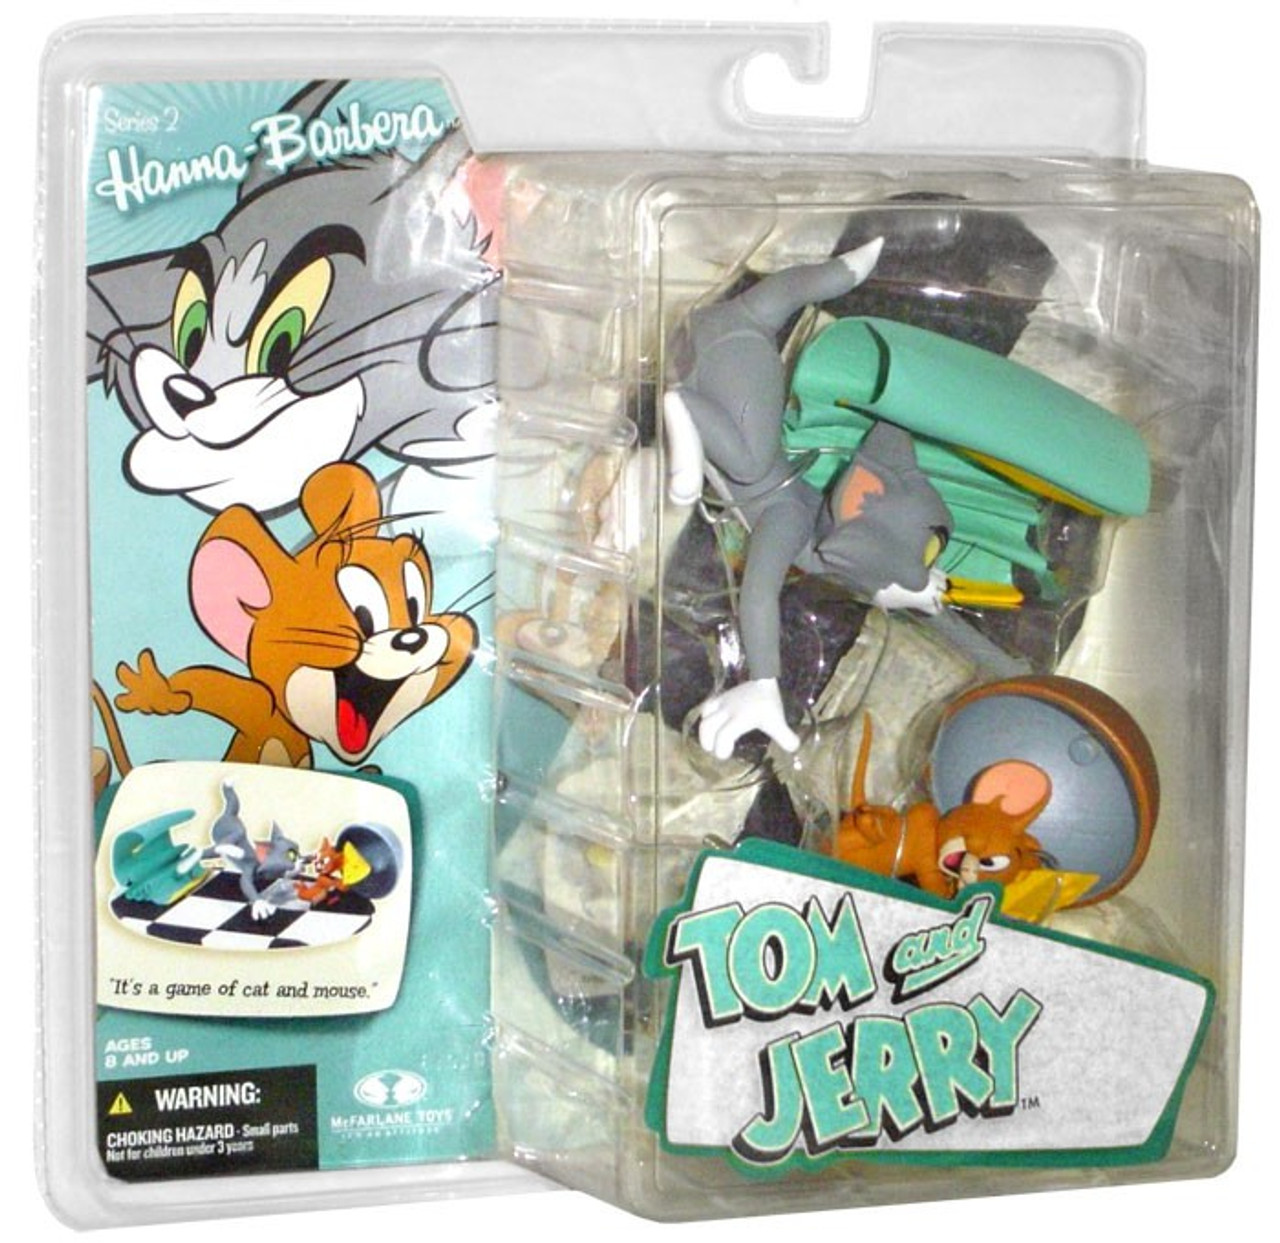 McFarlane Toys Hanna-Barbera Series 2 Tom & Jerry Action Figure 2-Pack